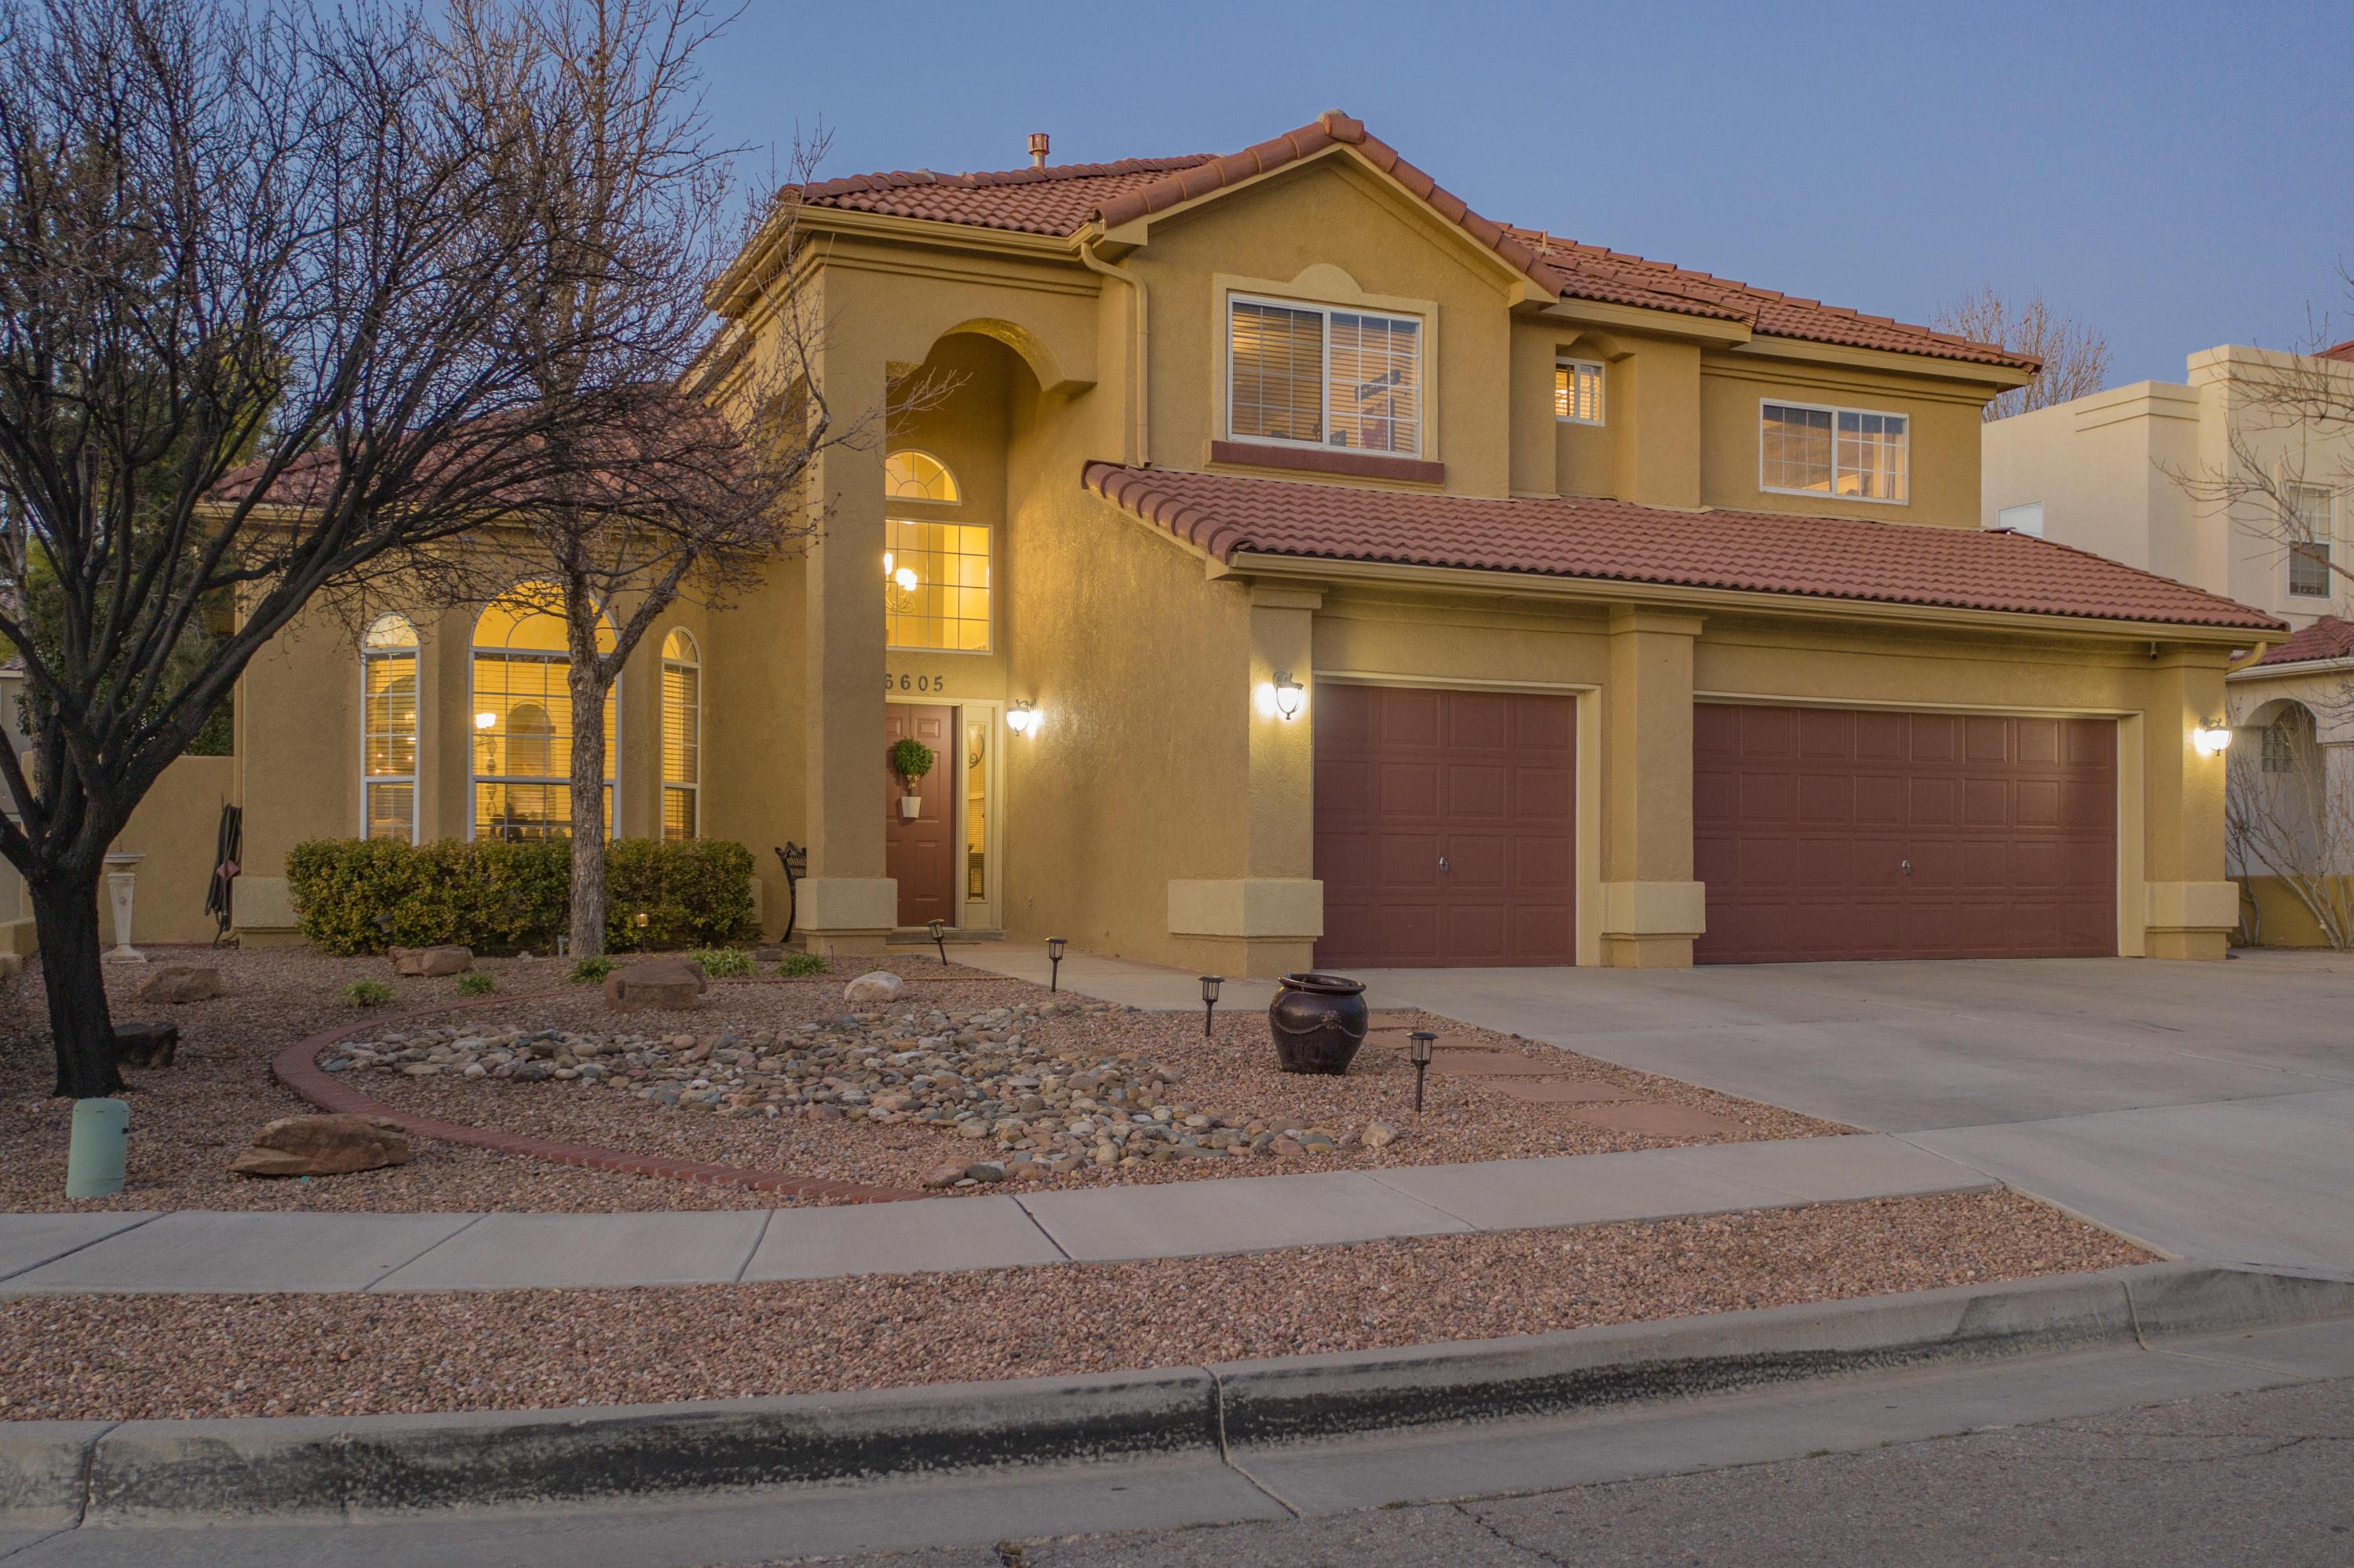 6605 TESORO Place NE Property Photo - Albuquerque, NM real estate listing